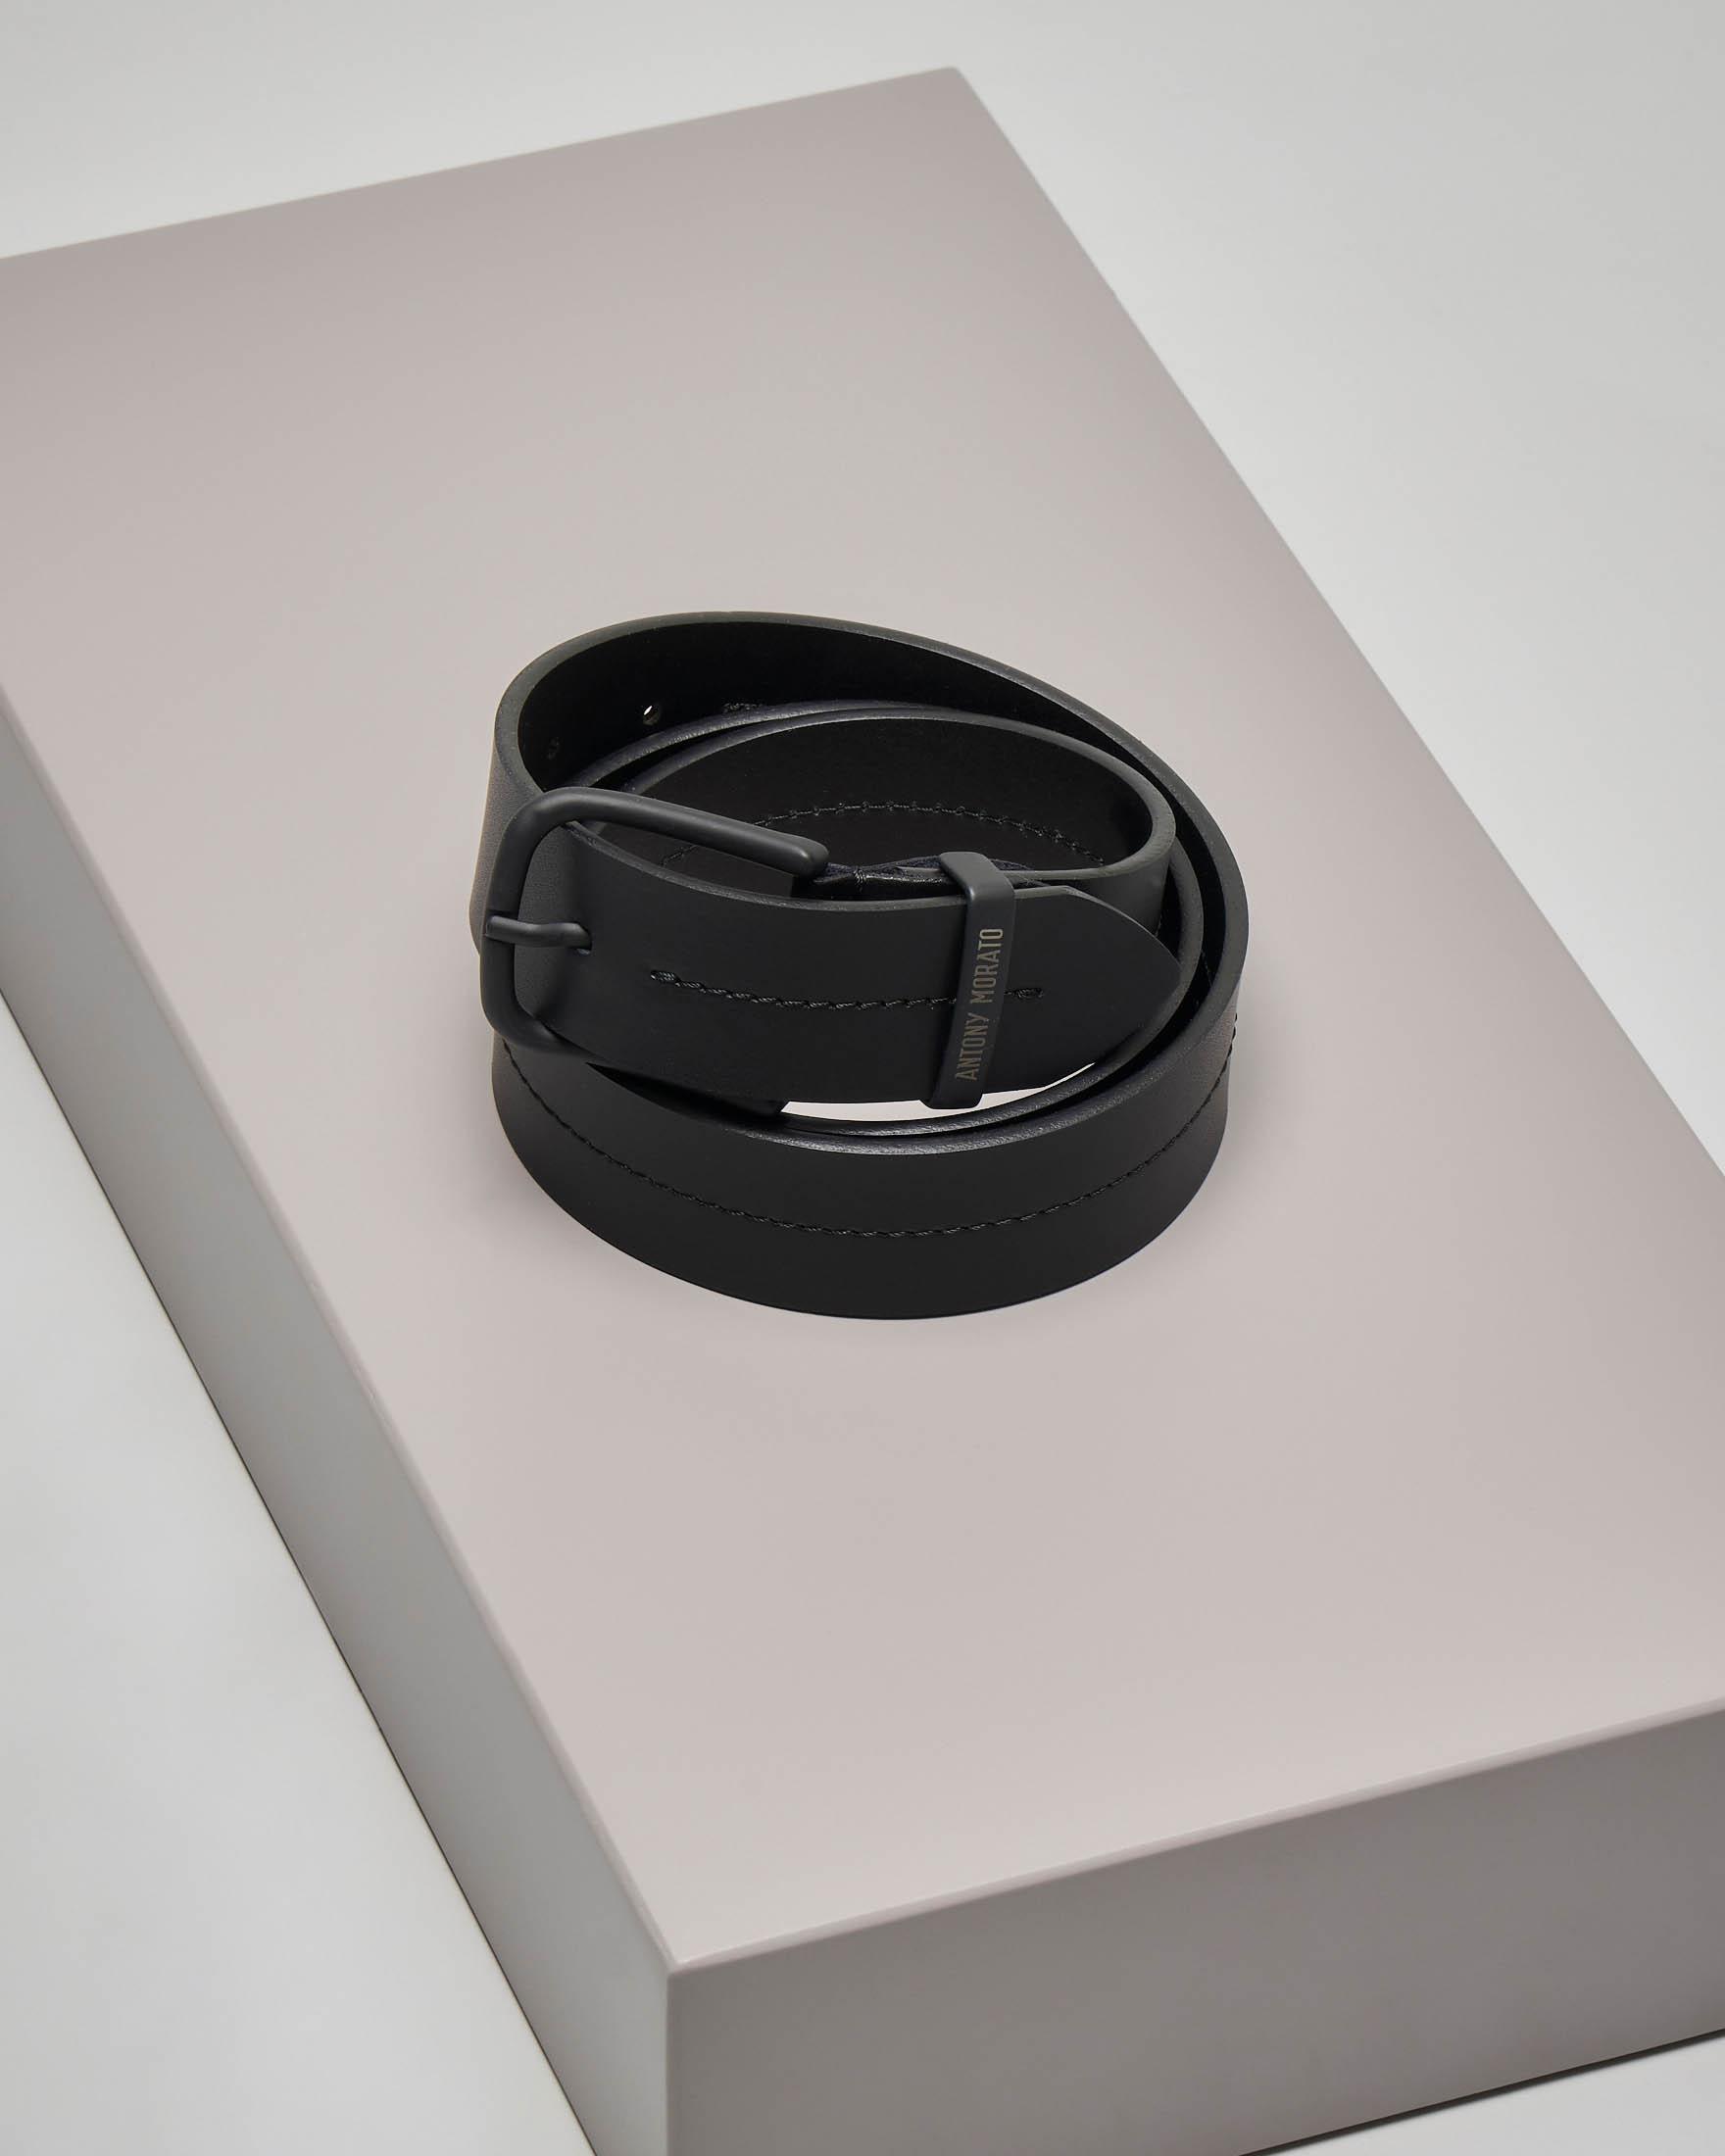 Cintura nera in pelle con cucitura centrale